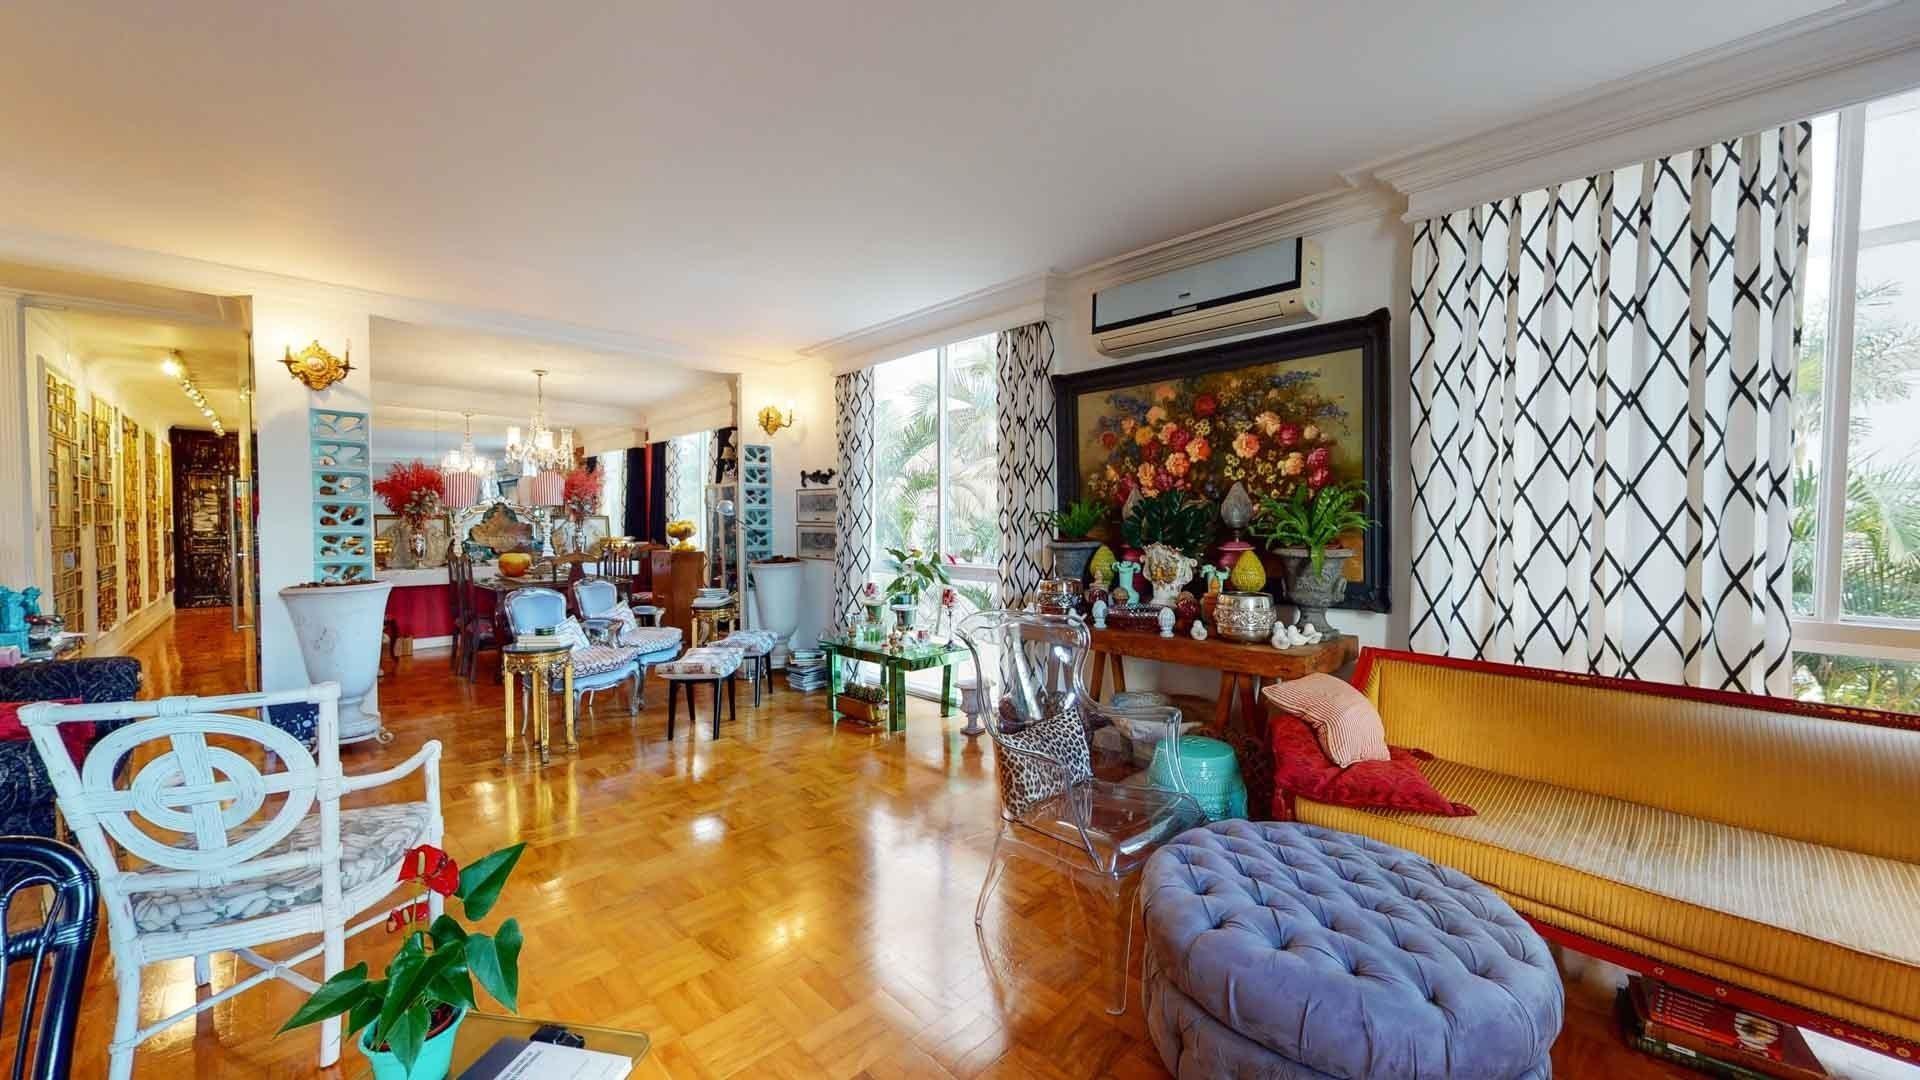 ApartamentoPadre Joao Manuel